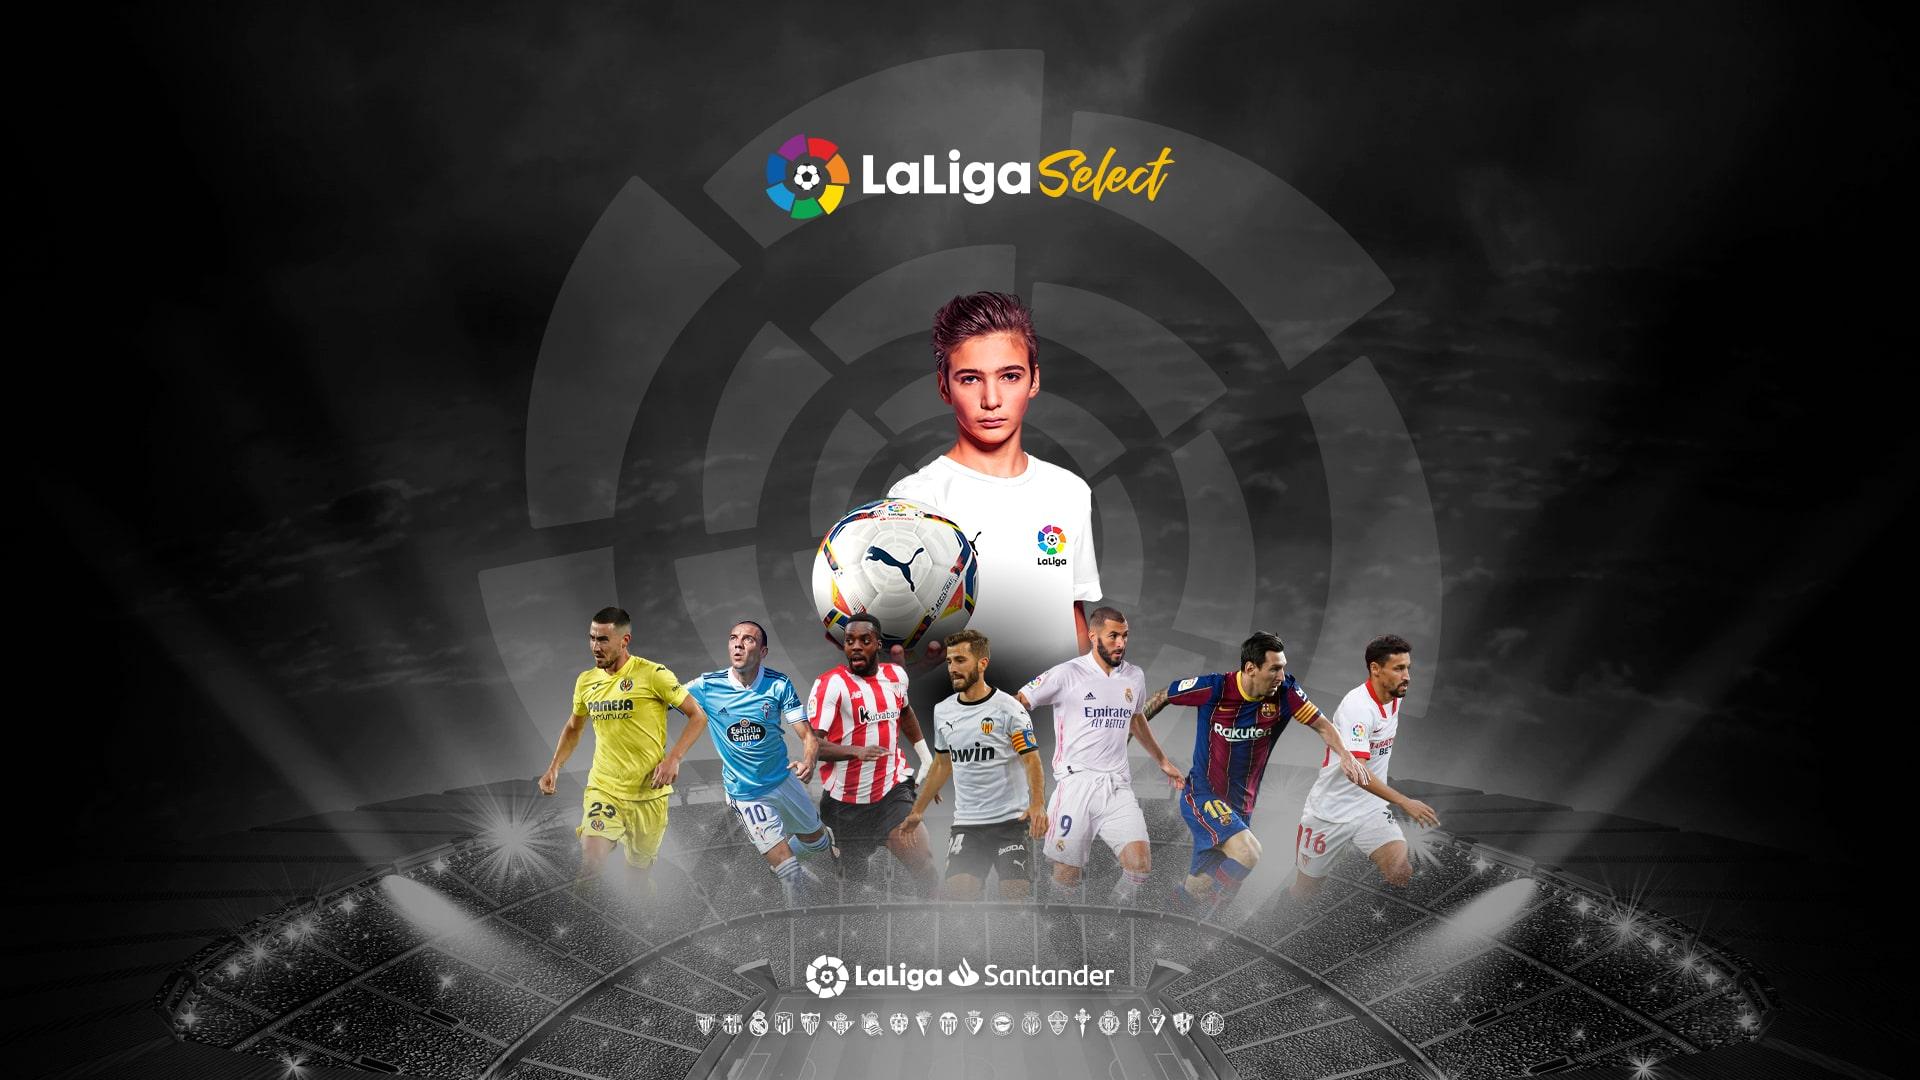 LaLiga Next